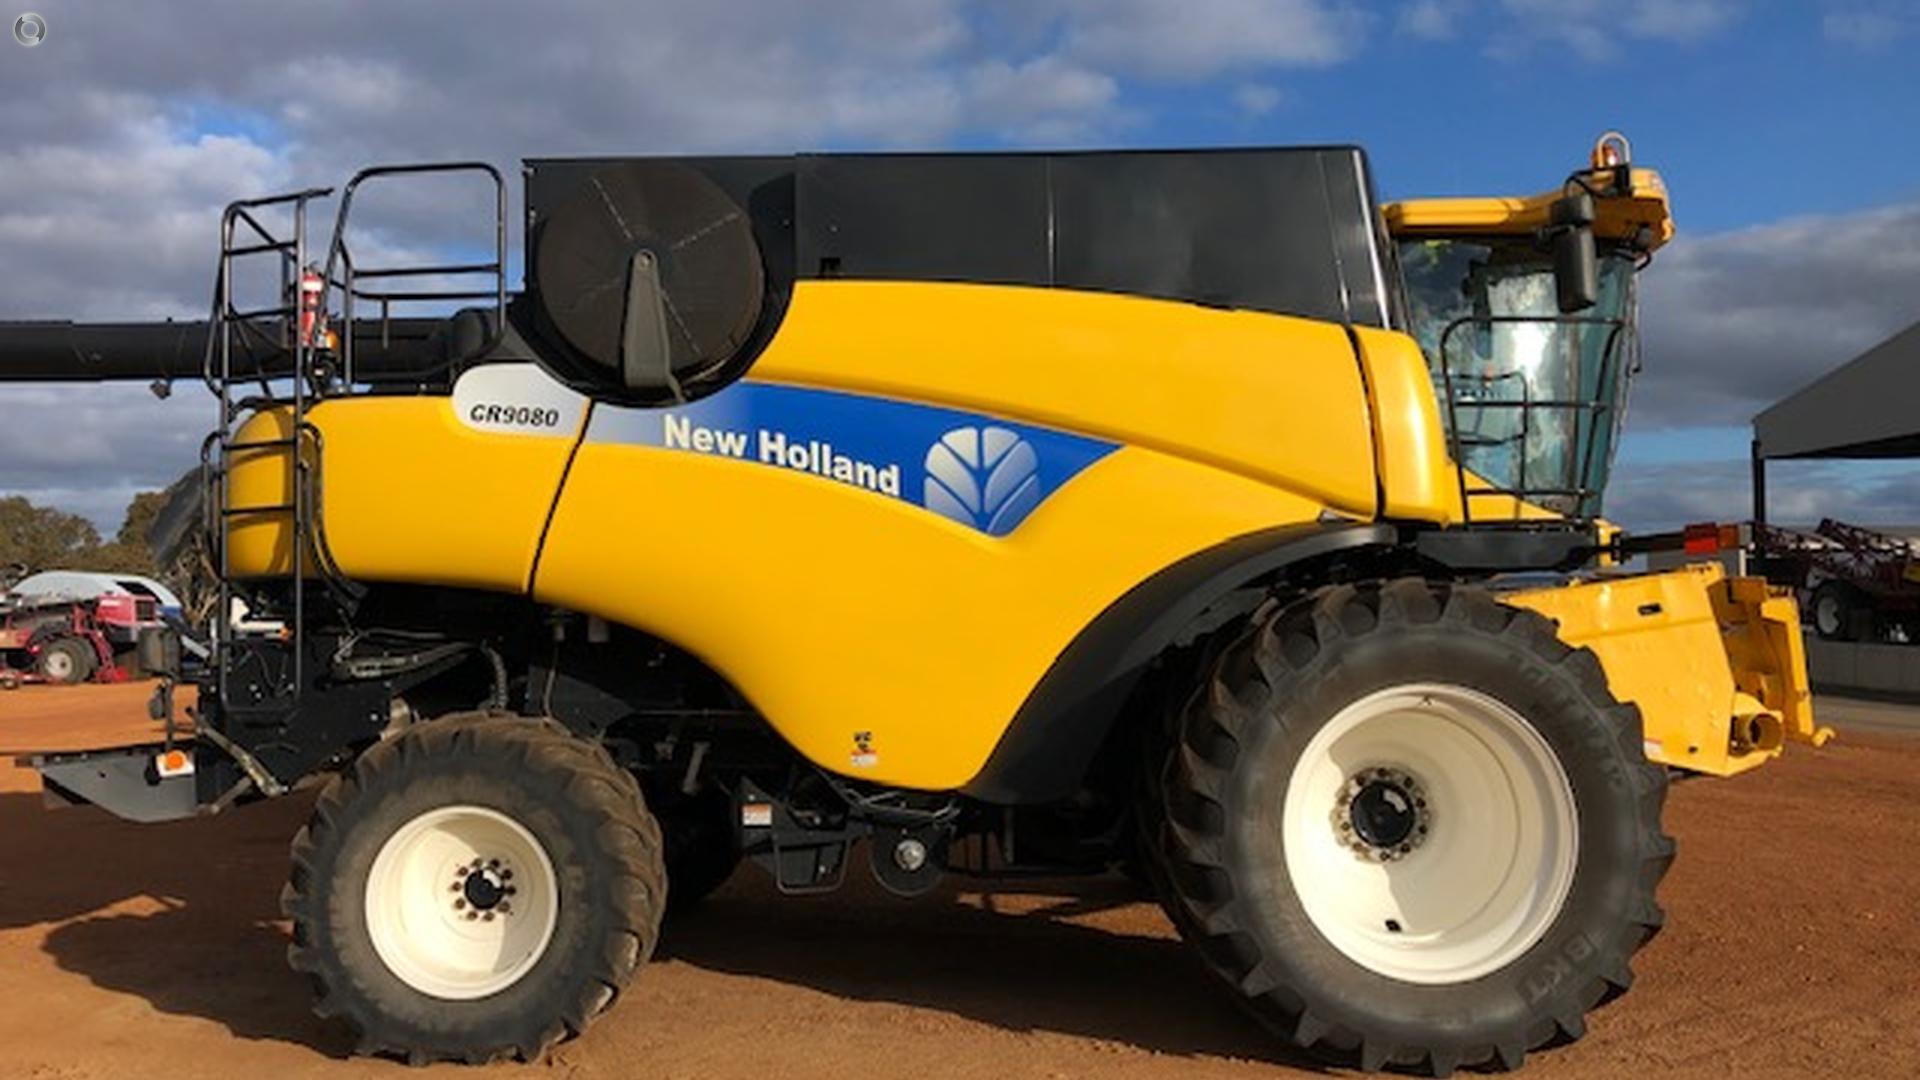 2011 New Holland CR9080 Combine Harvester